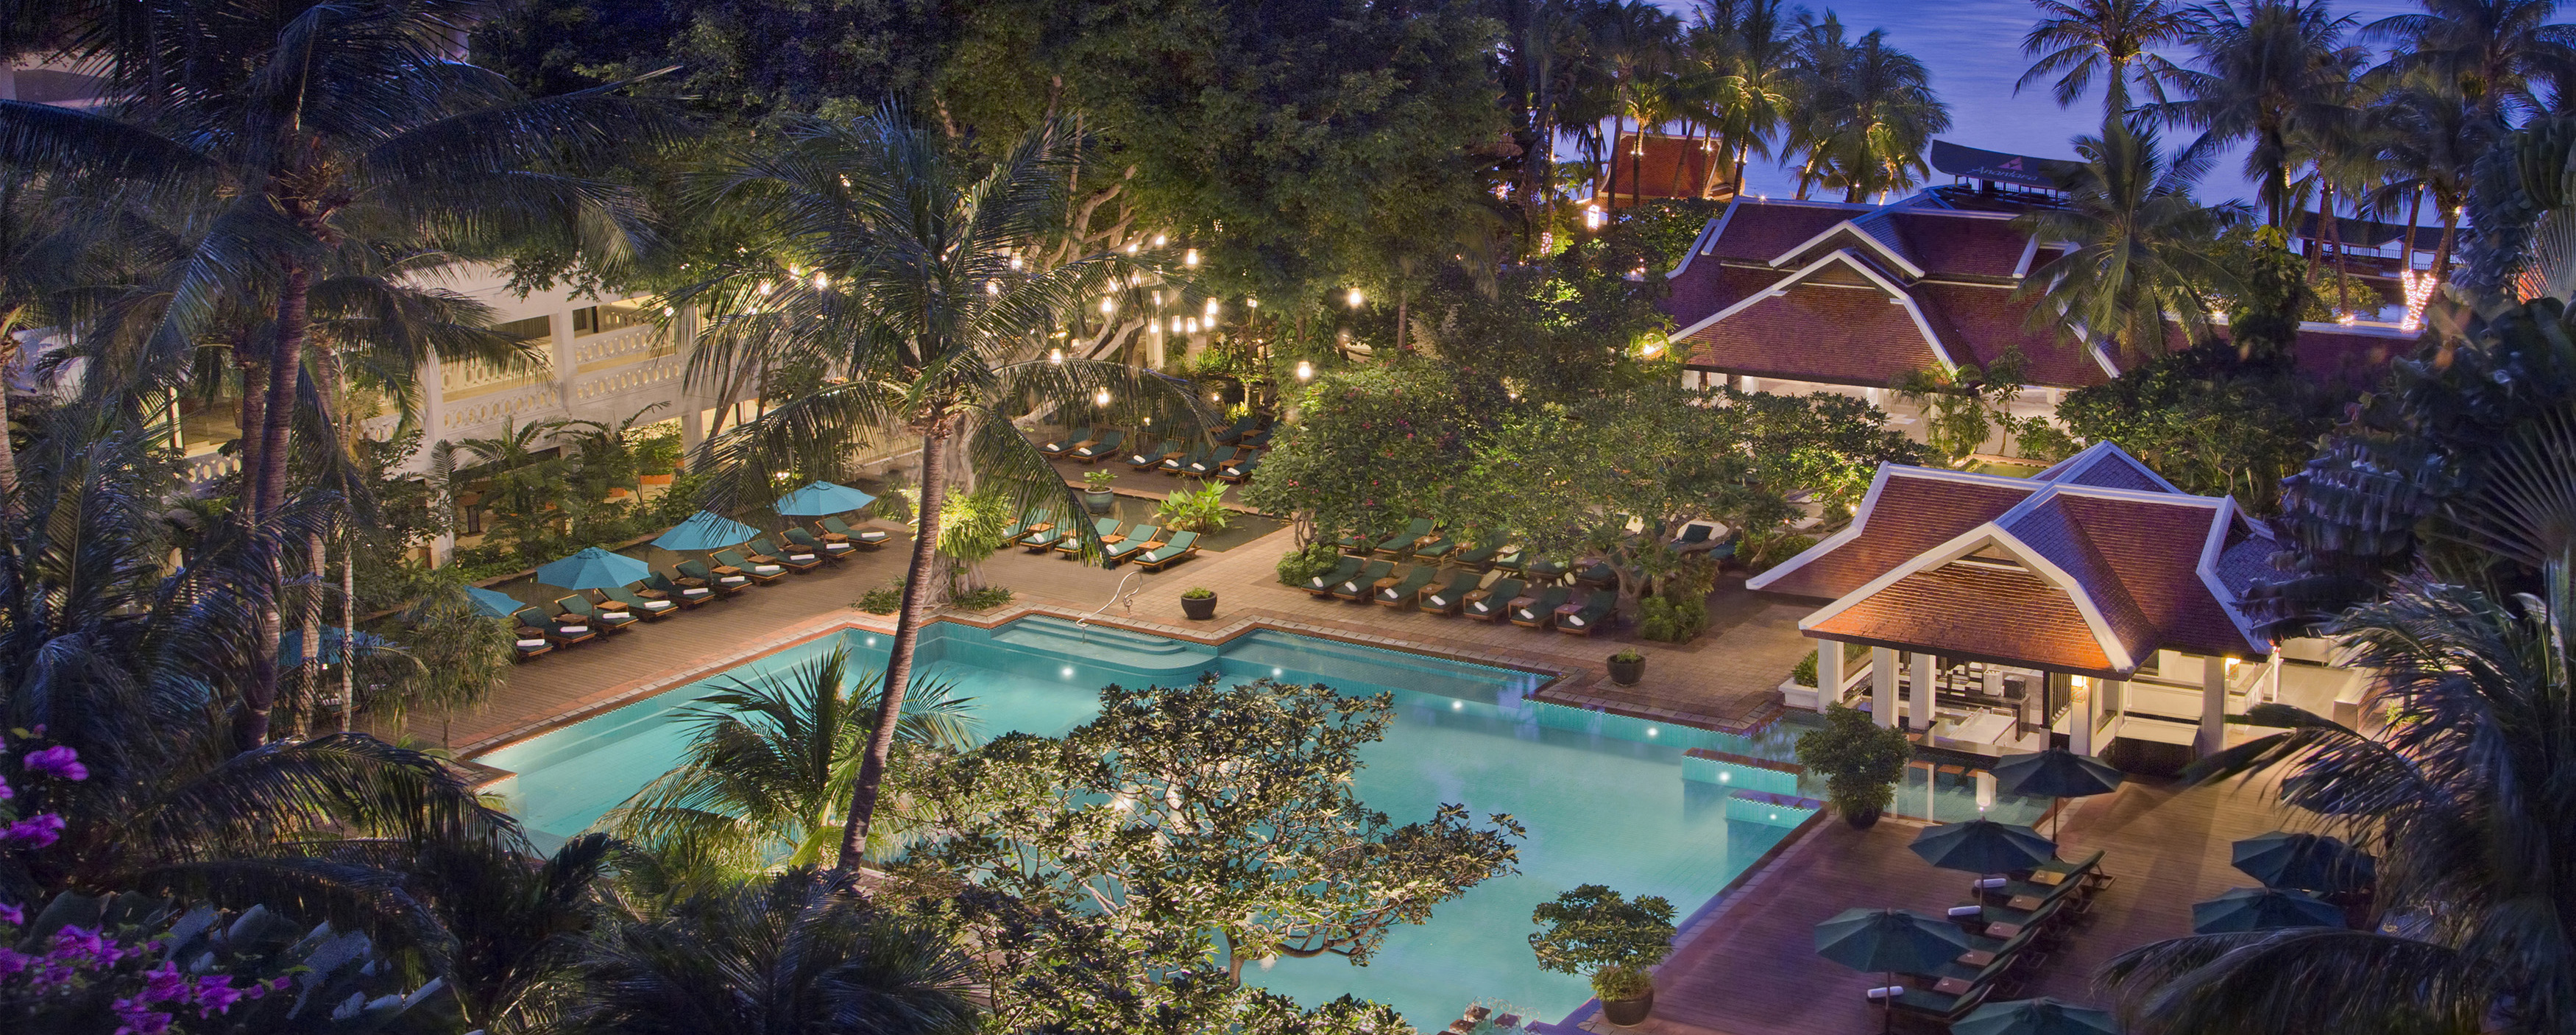 anantara-riverside-bangkok-twlight